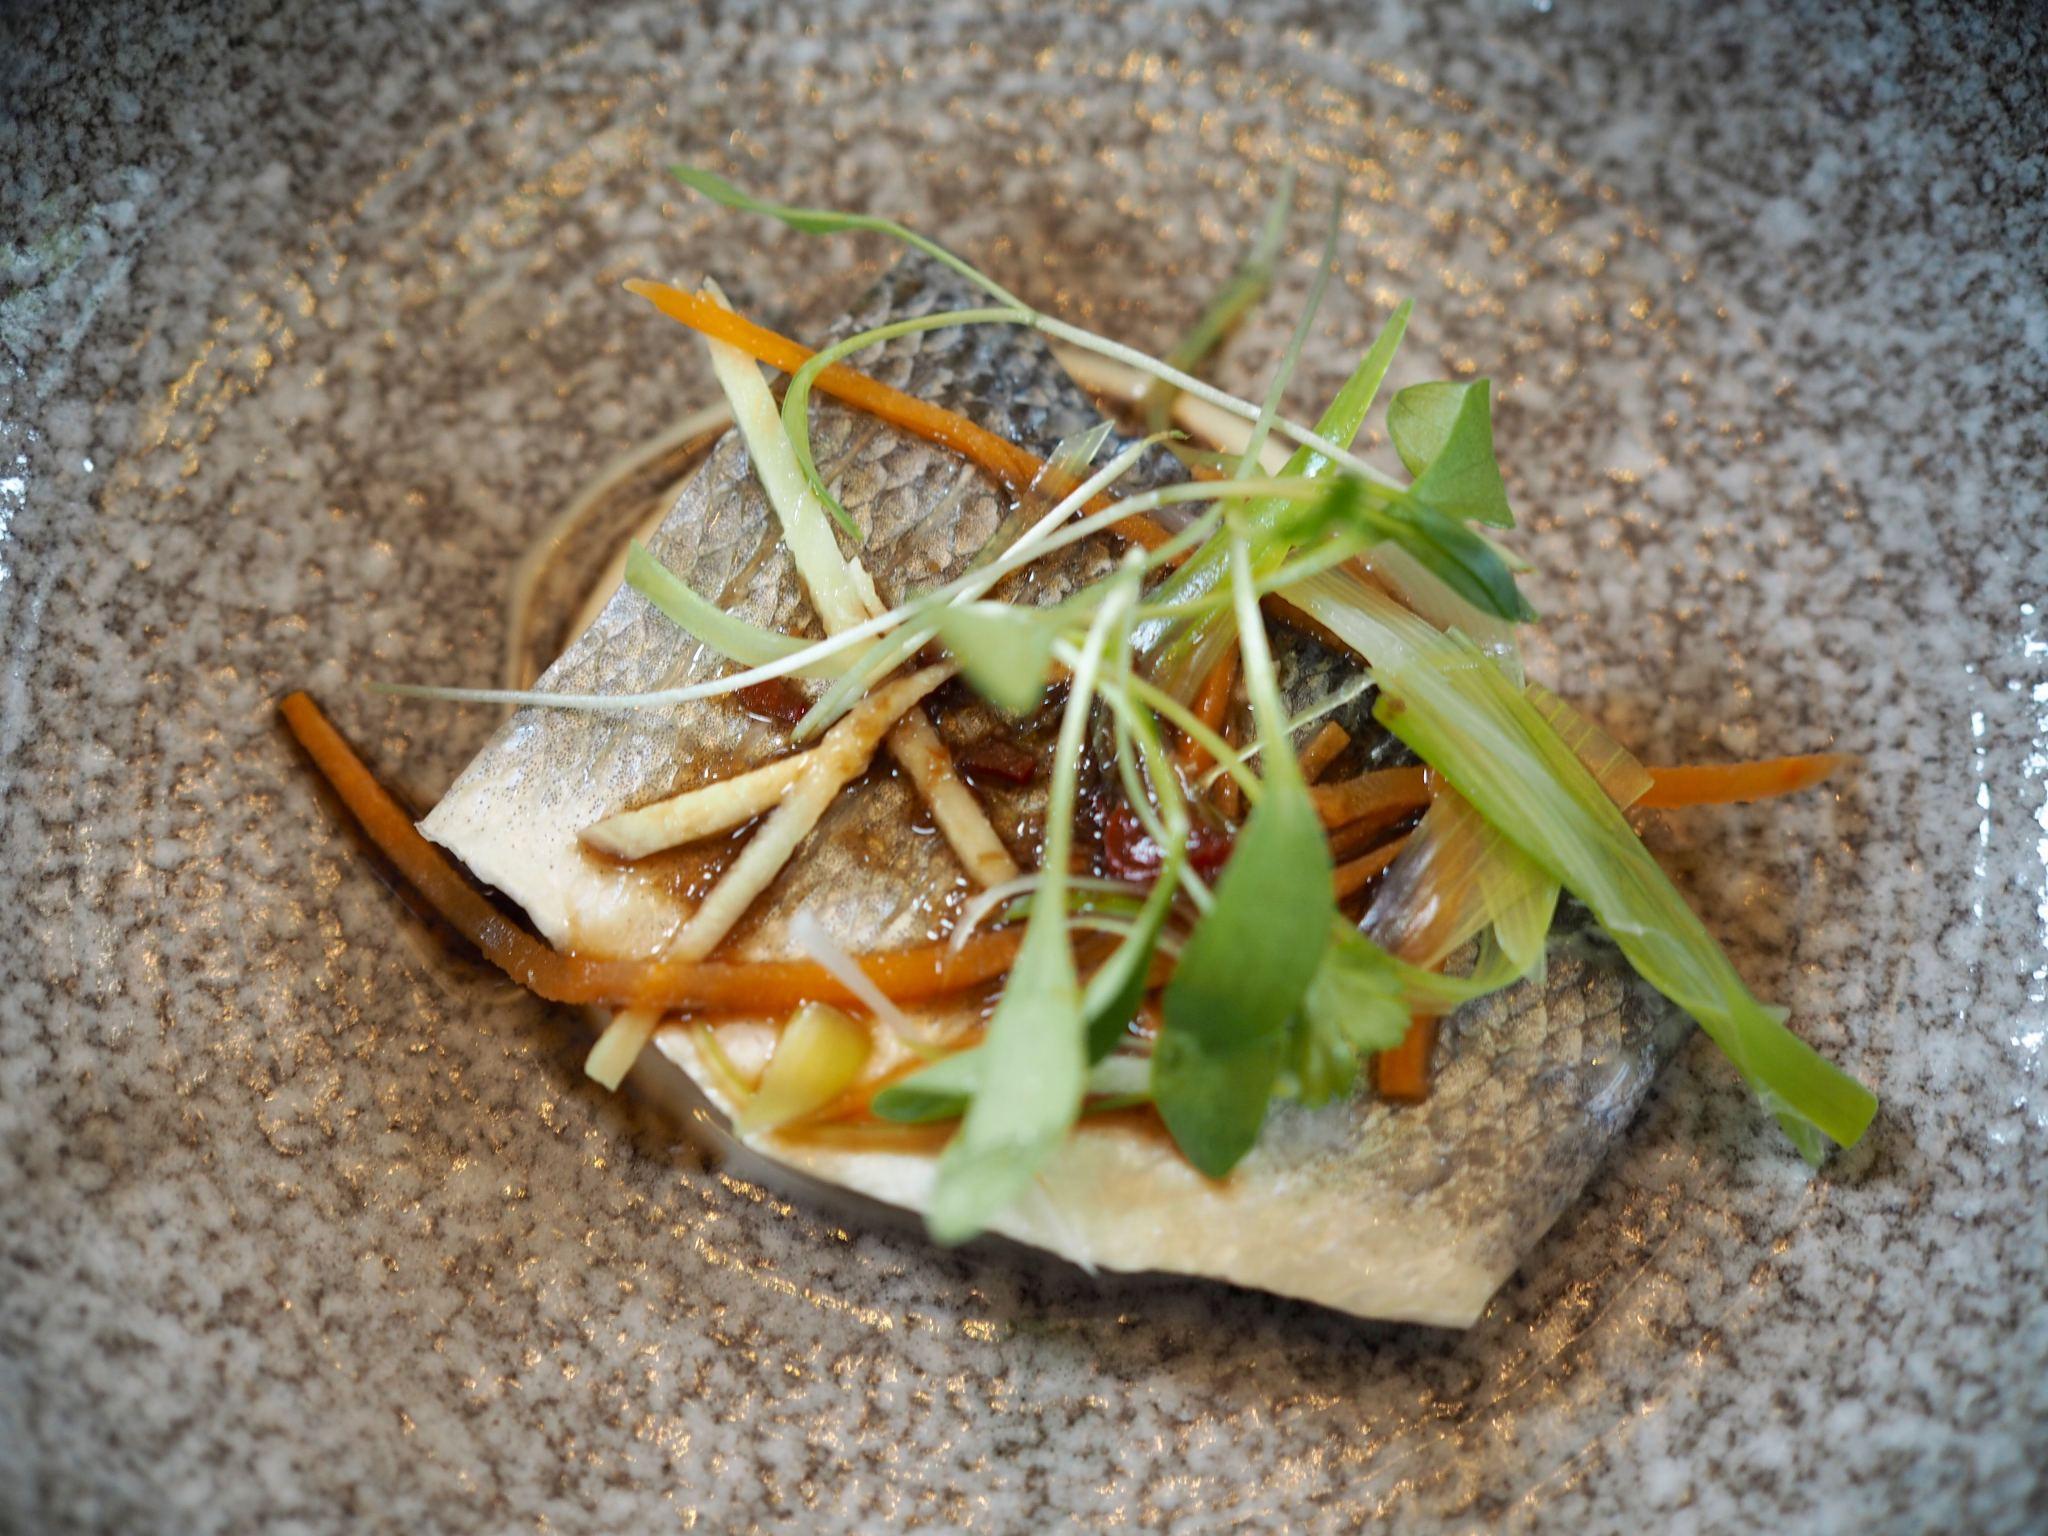 Chelsea Iceland School of fish cooking school neil nugent sea bream